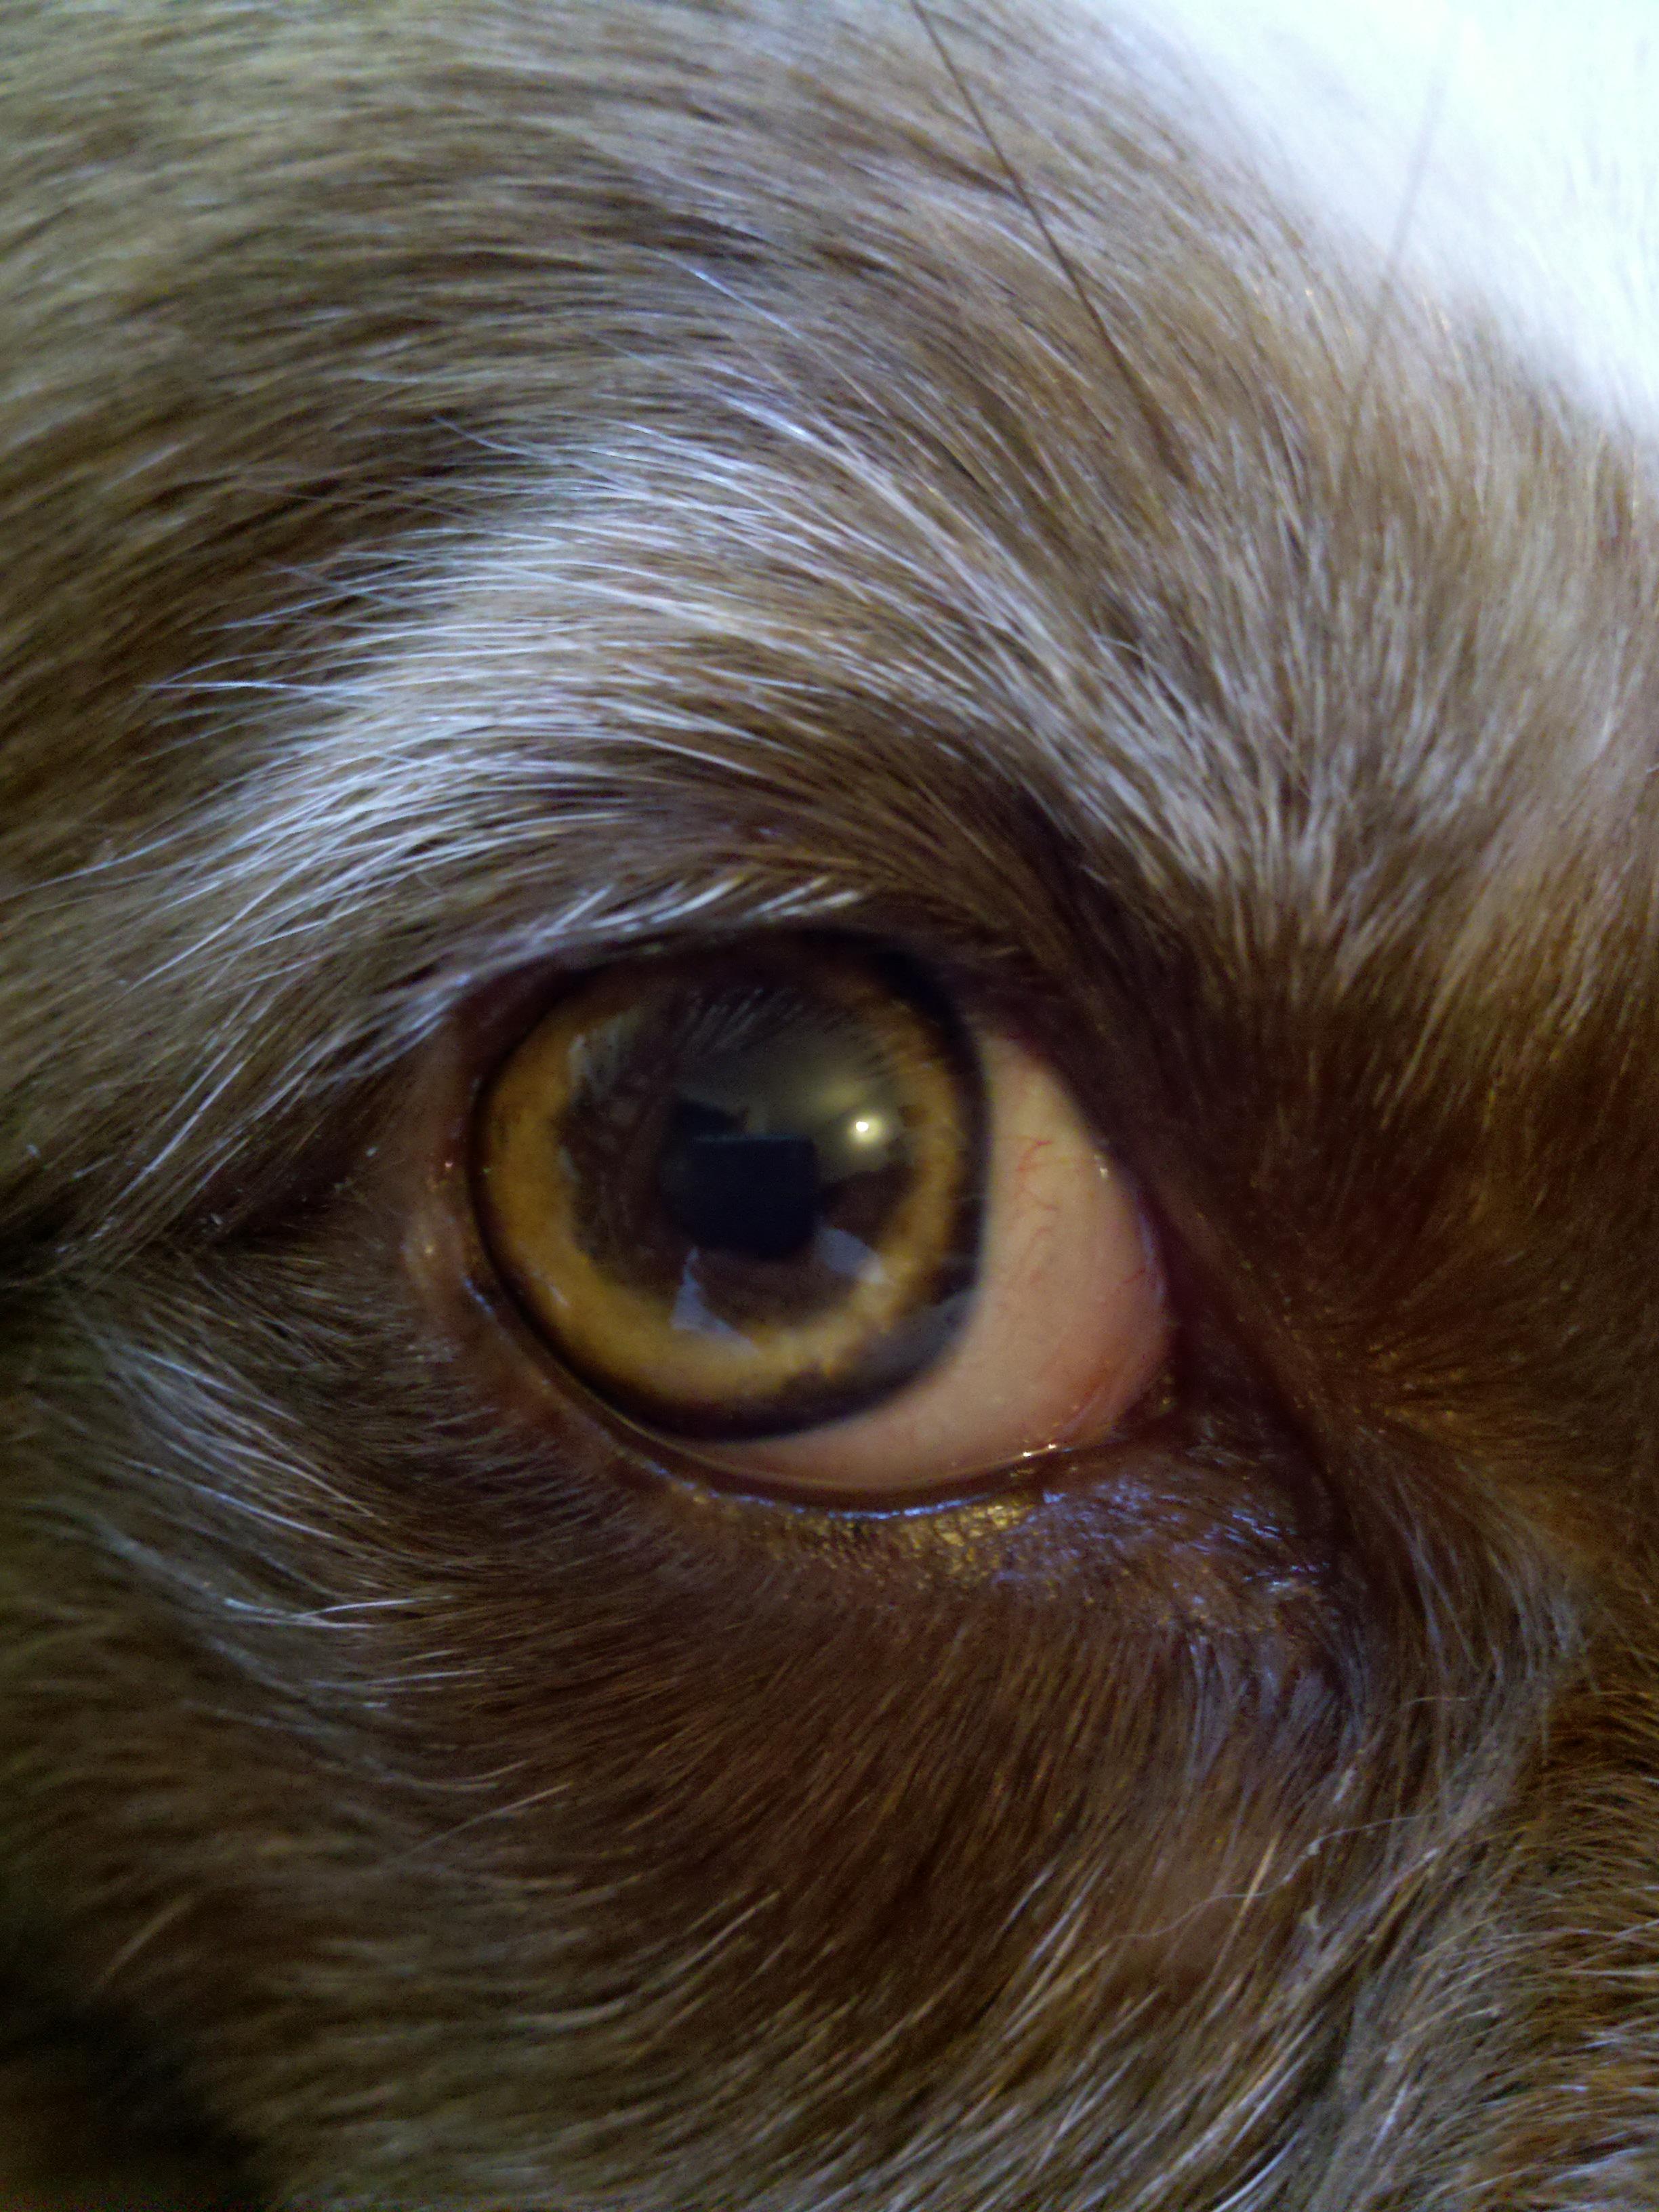 Fullsize Of Dogs Eyes Are Red